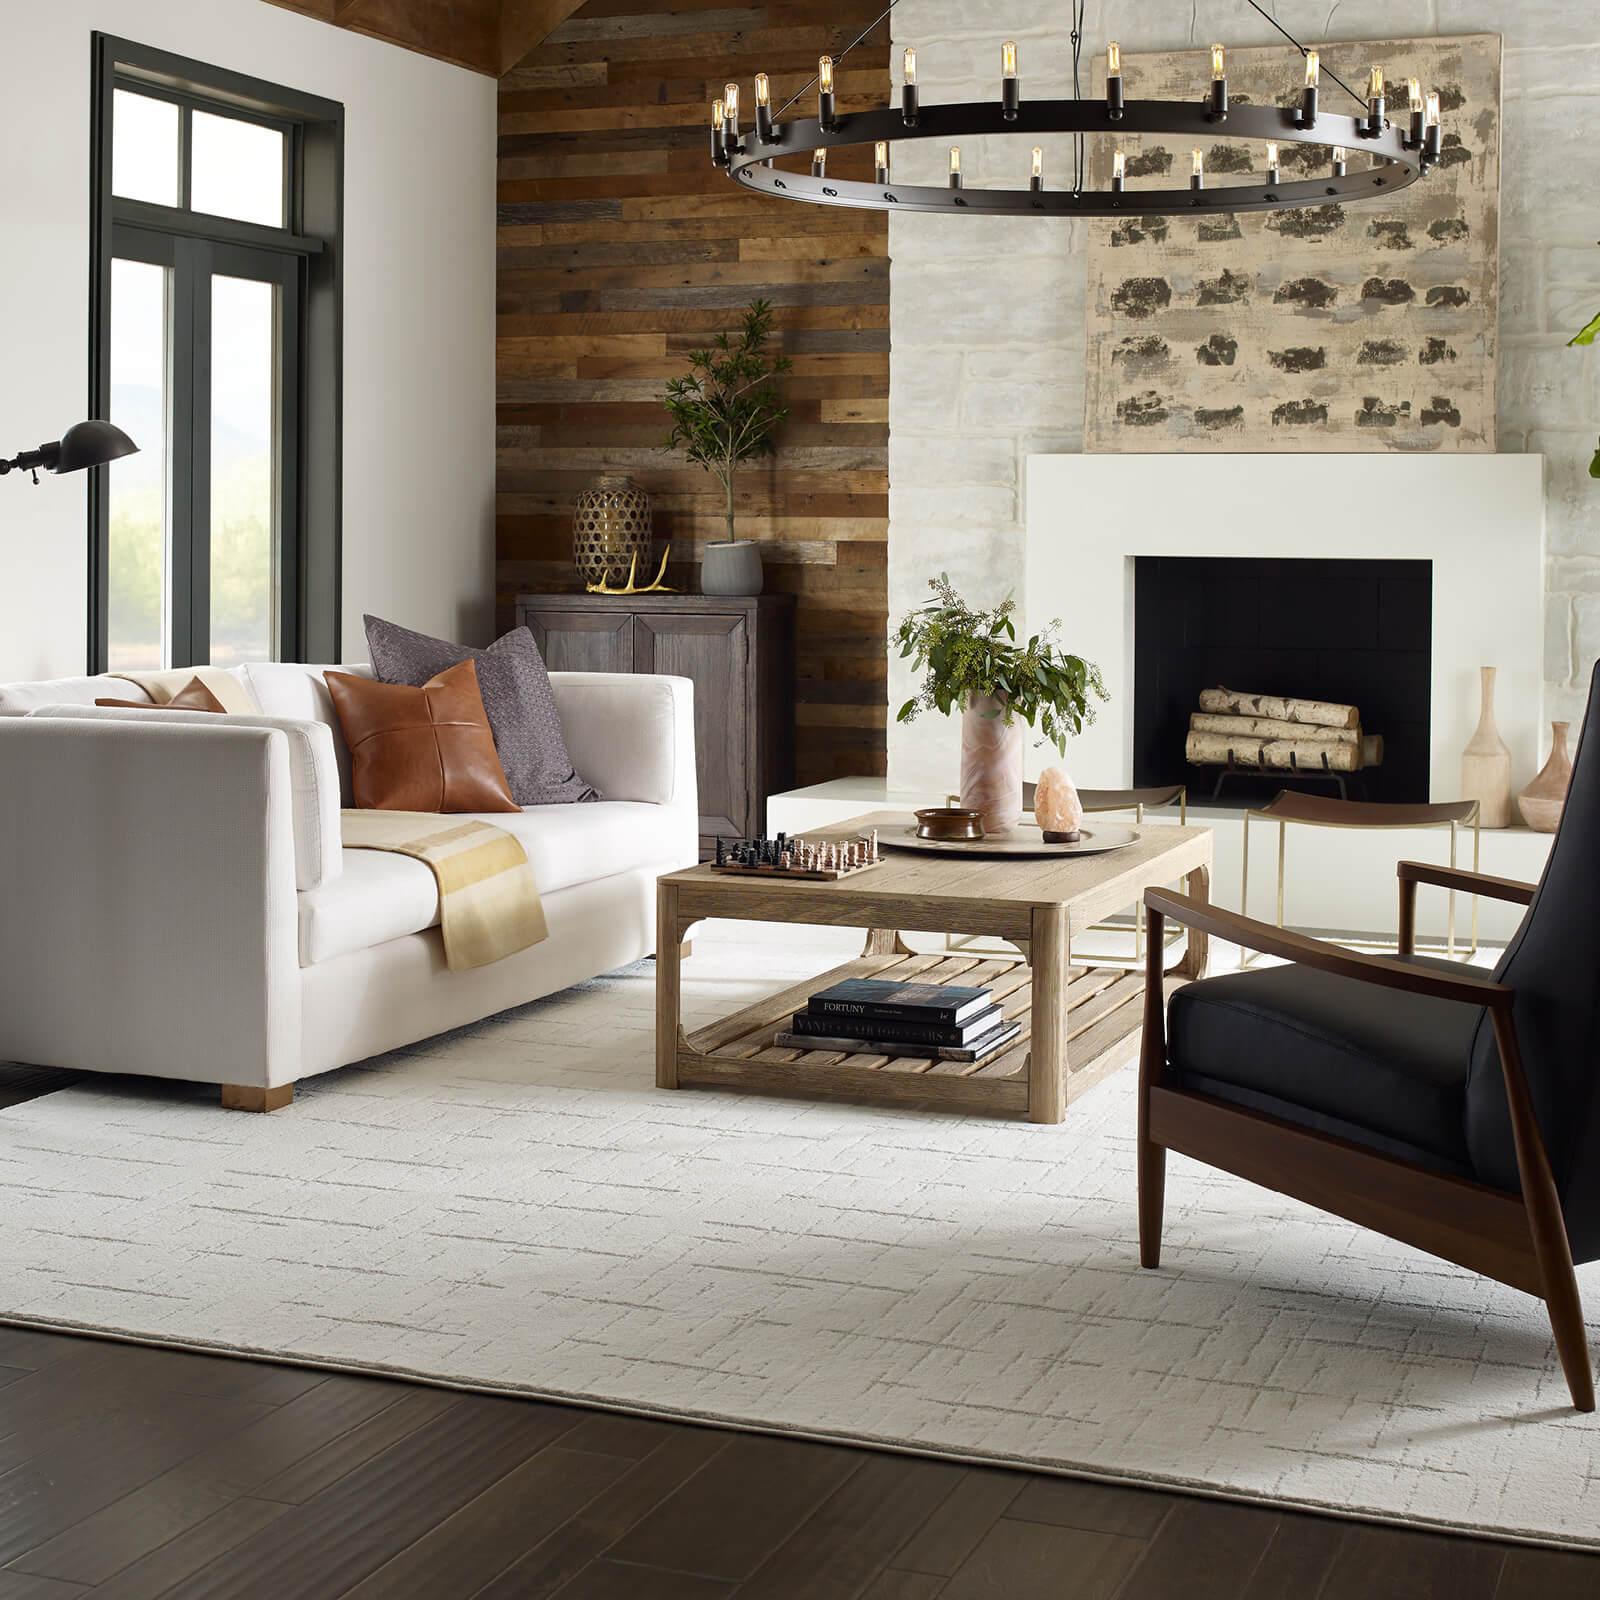 custom area rug in living room | Mill Direct Floor Coverings